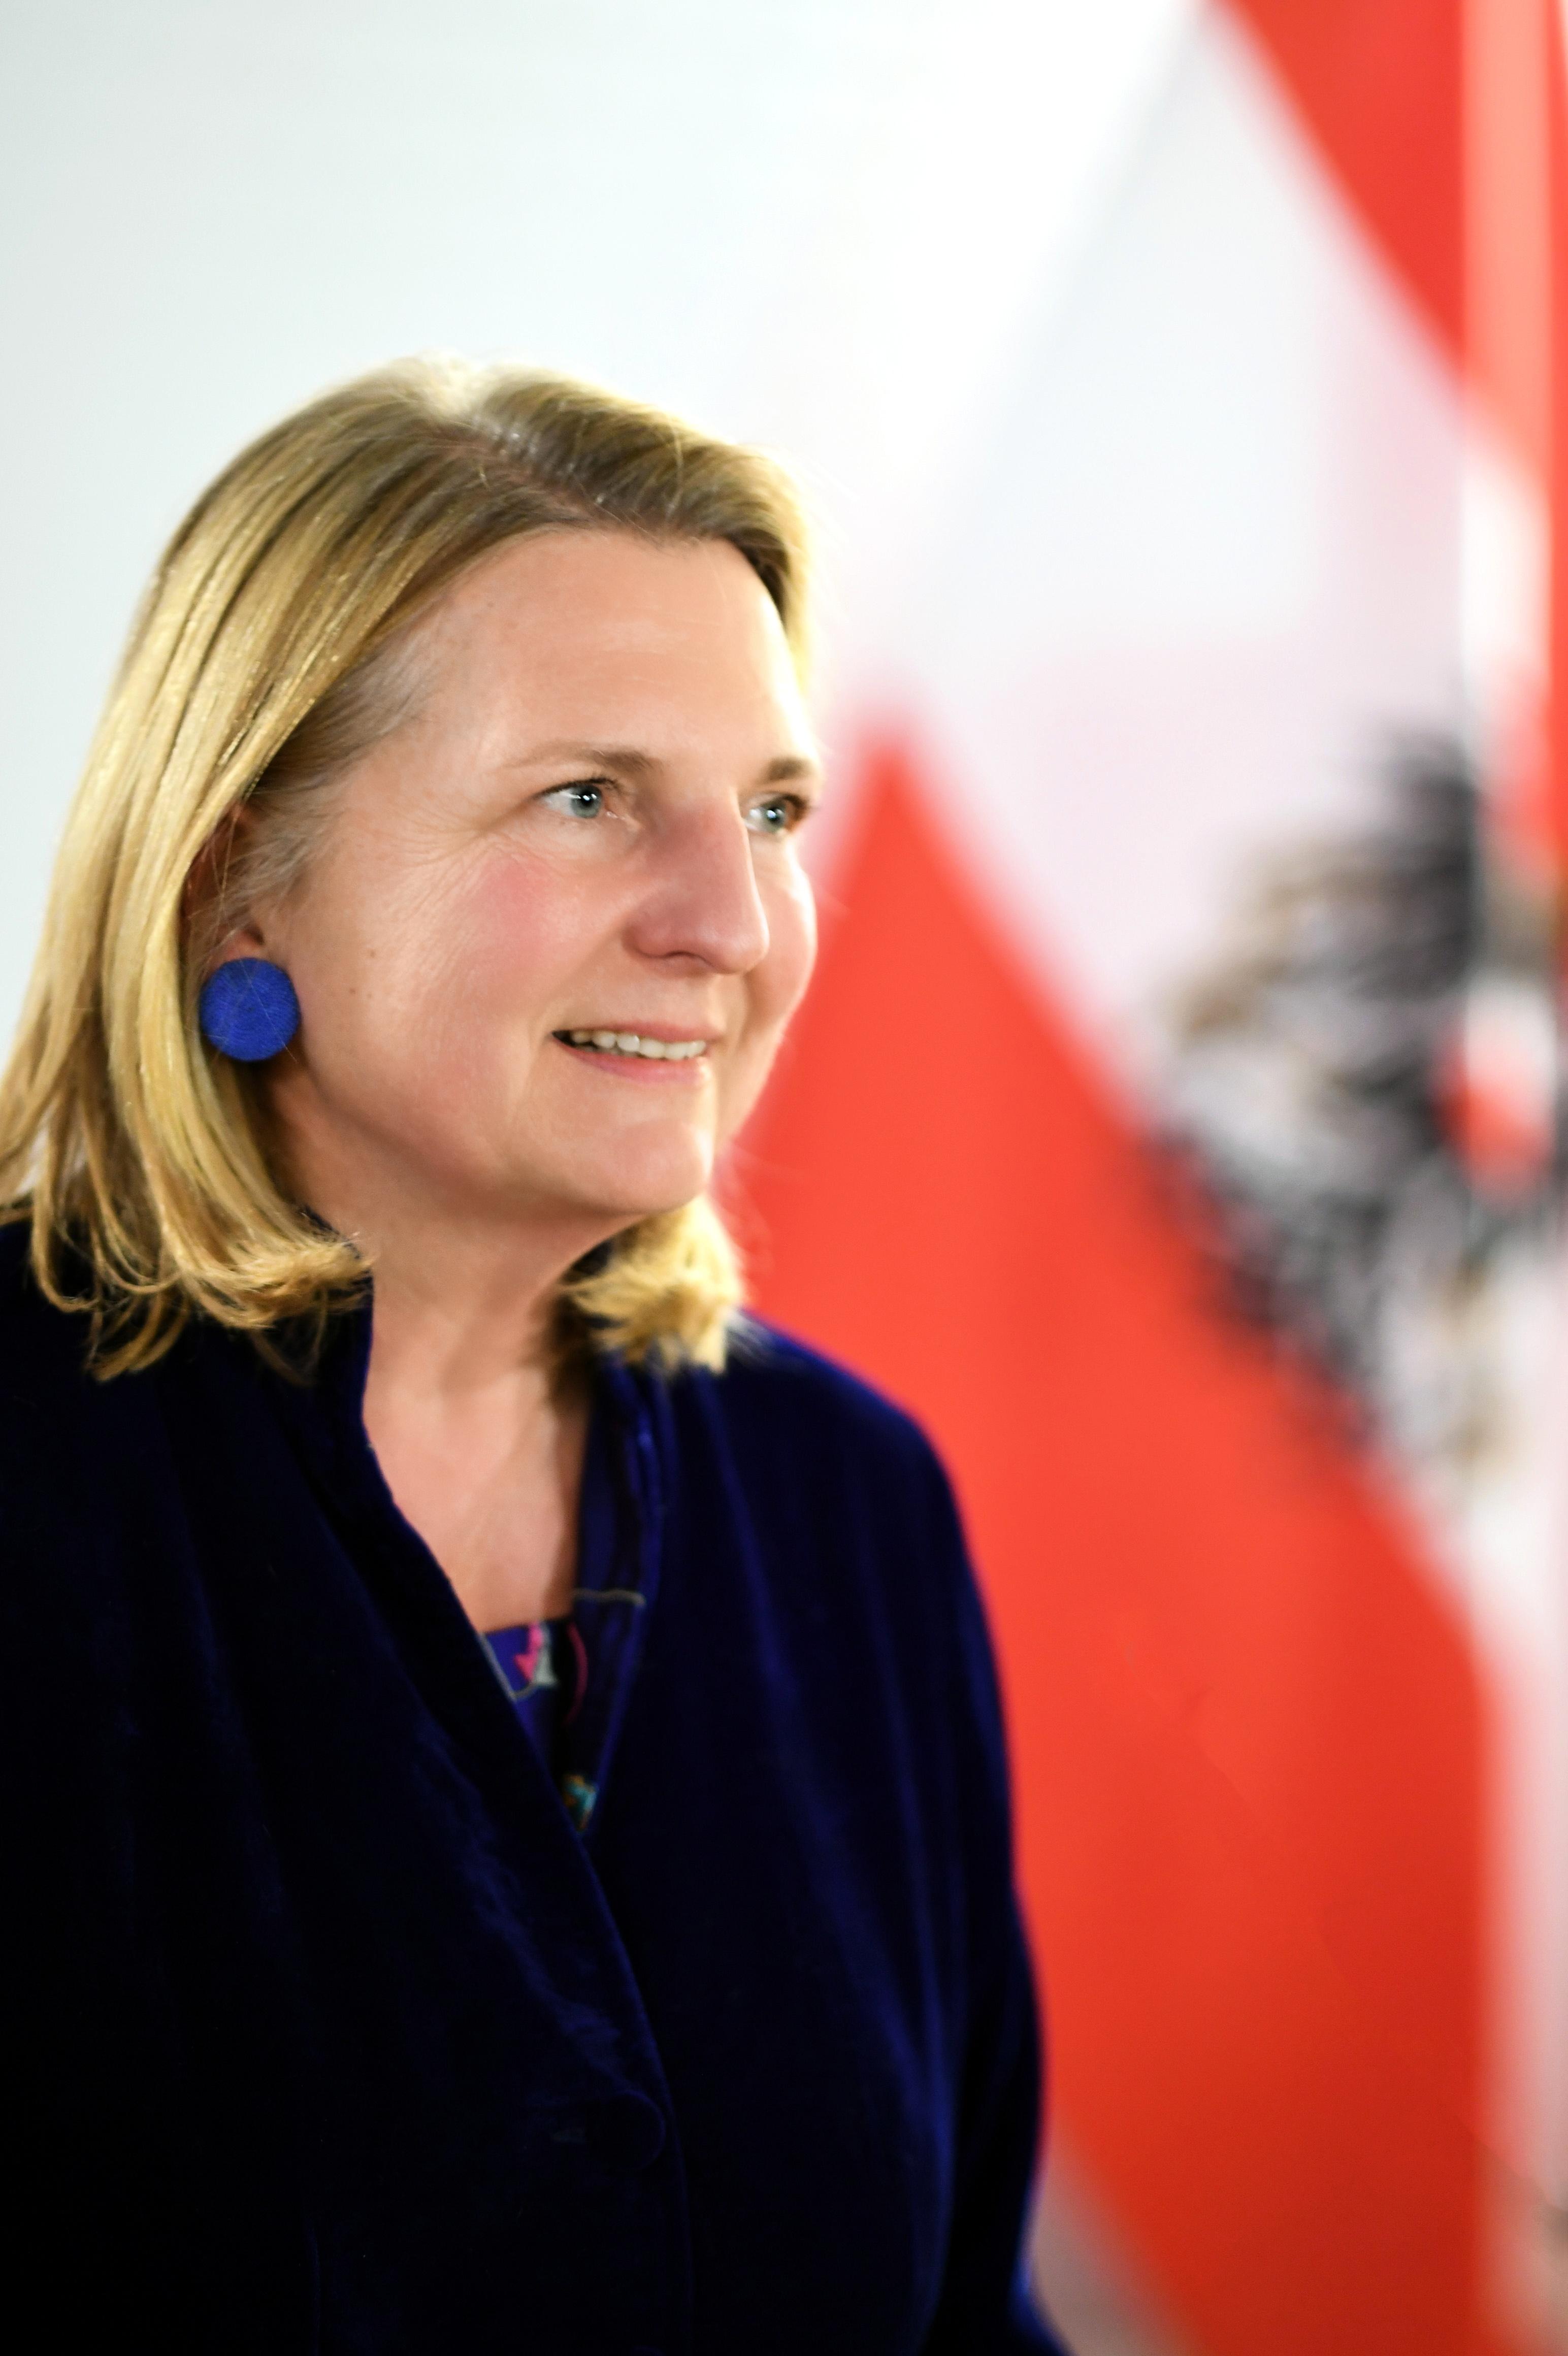 Karin Kneissl – Wikipedia